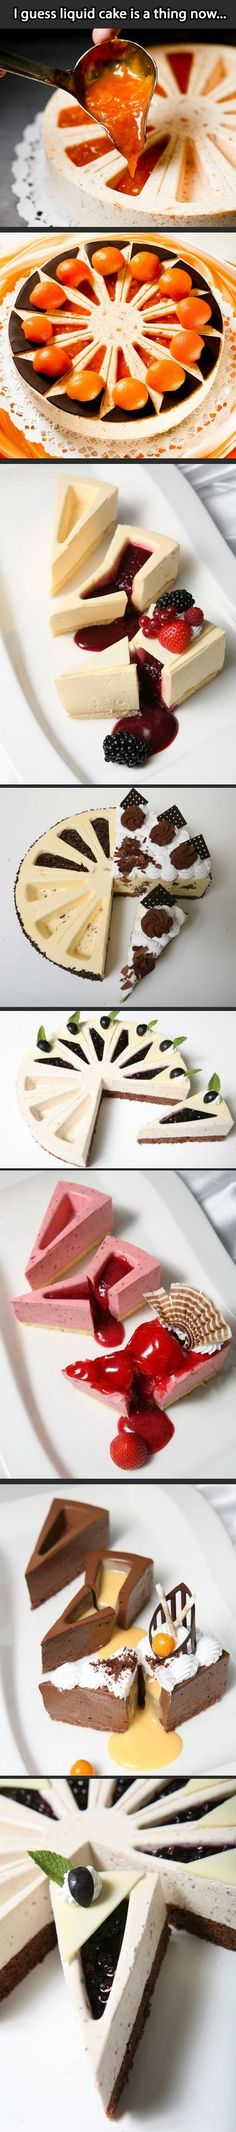 I'd eat it. I'd eat it. I'm thinking plain cheesecake with liquid strawberry :DLiquid cake? I'd eat it. I'm thinking plain cheesecake with liquid strawberry :D Just Desserts, Delicious Desserts, Yummy Food, Baking Desserts, Yummy Yummy, Sweet Recipes, Cake Recipes, Dessert Recipes, Food Cakes